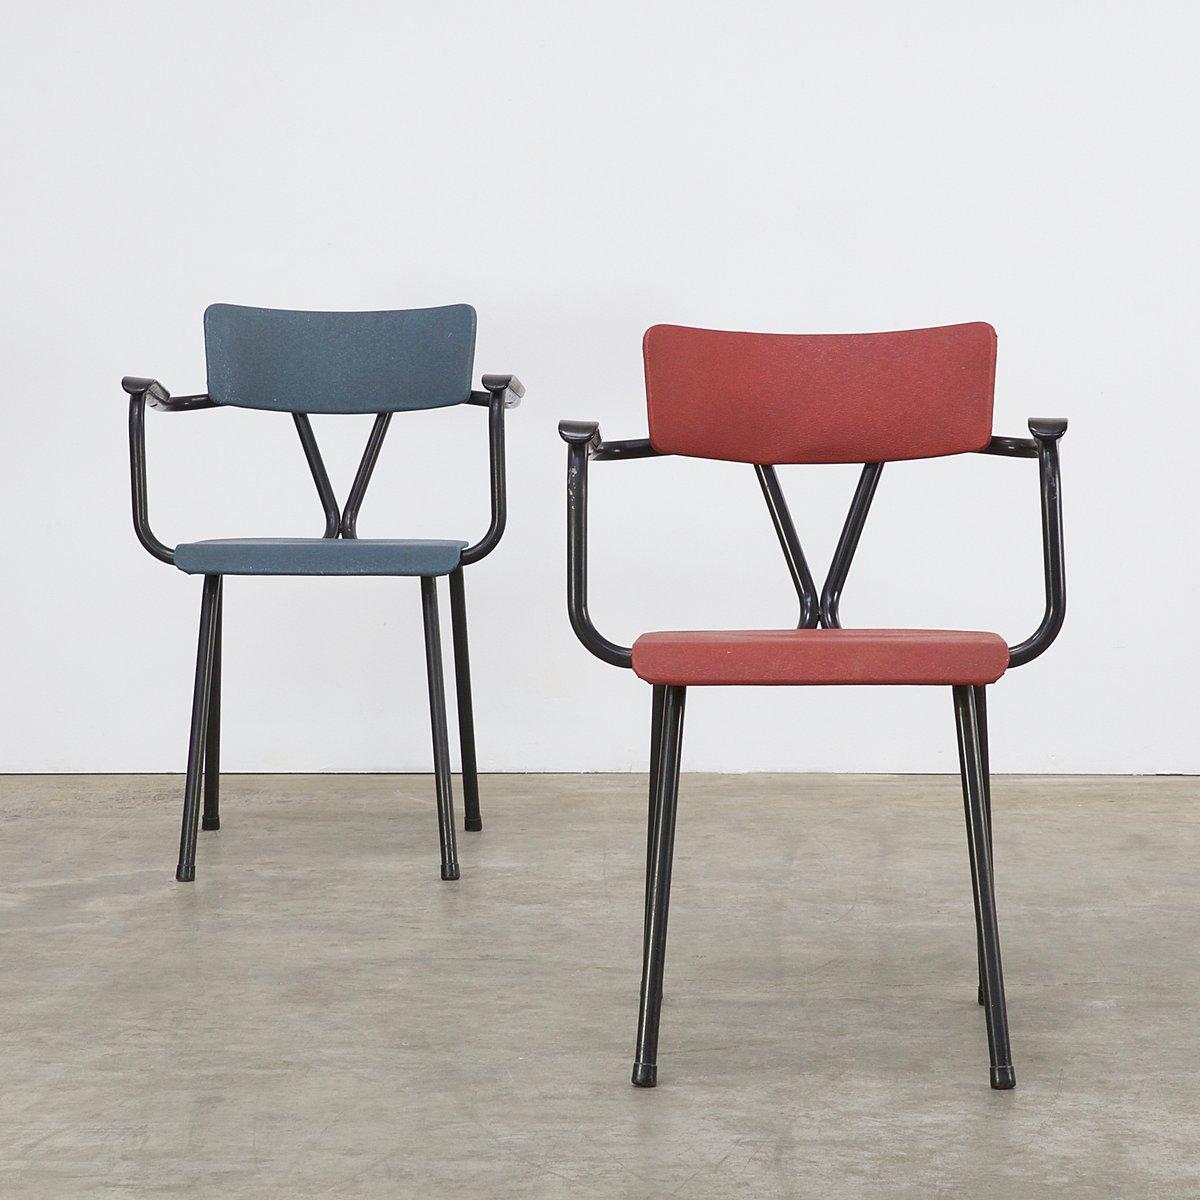 Sedie da ufficio rosse e blu anni 39 50 set di 2 in for Sedie da ufficio design